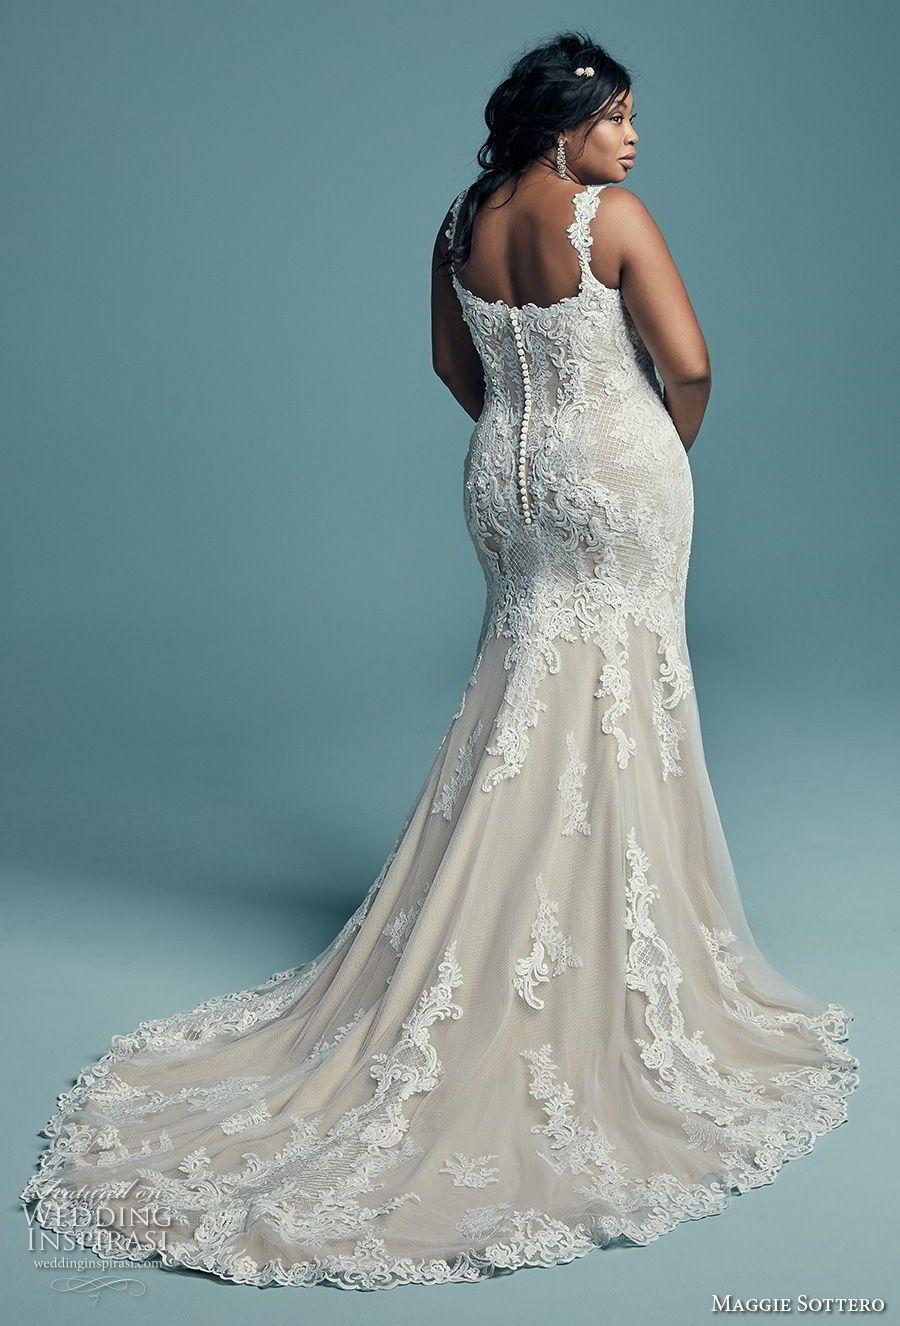 Elegant mermaid wedding dresses  Maggie Sottero Fall  Wedding Dresses u ucLucienneud Bridal